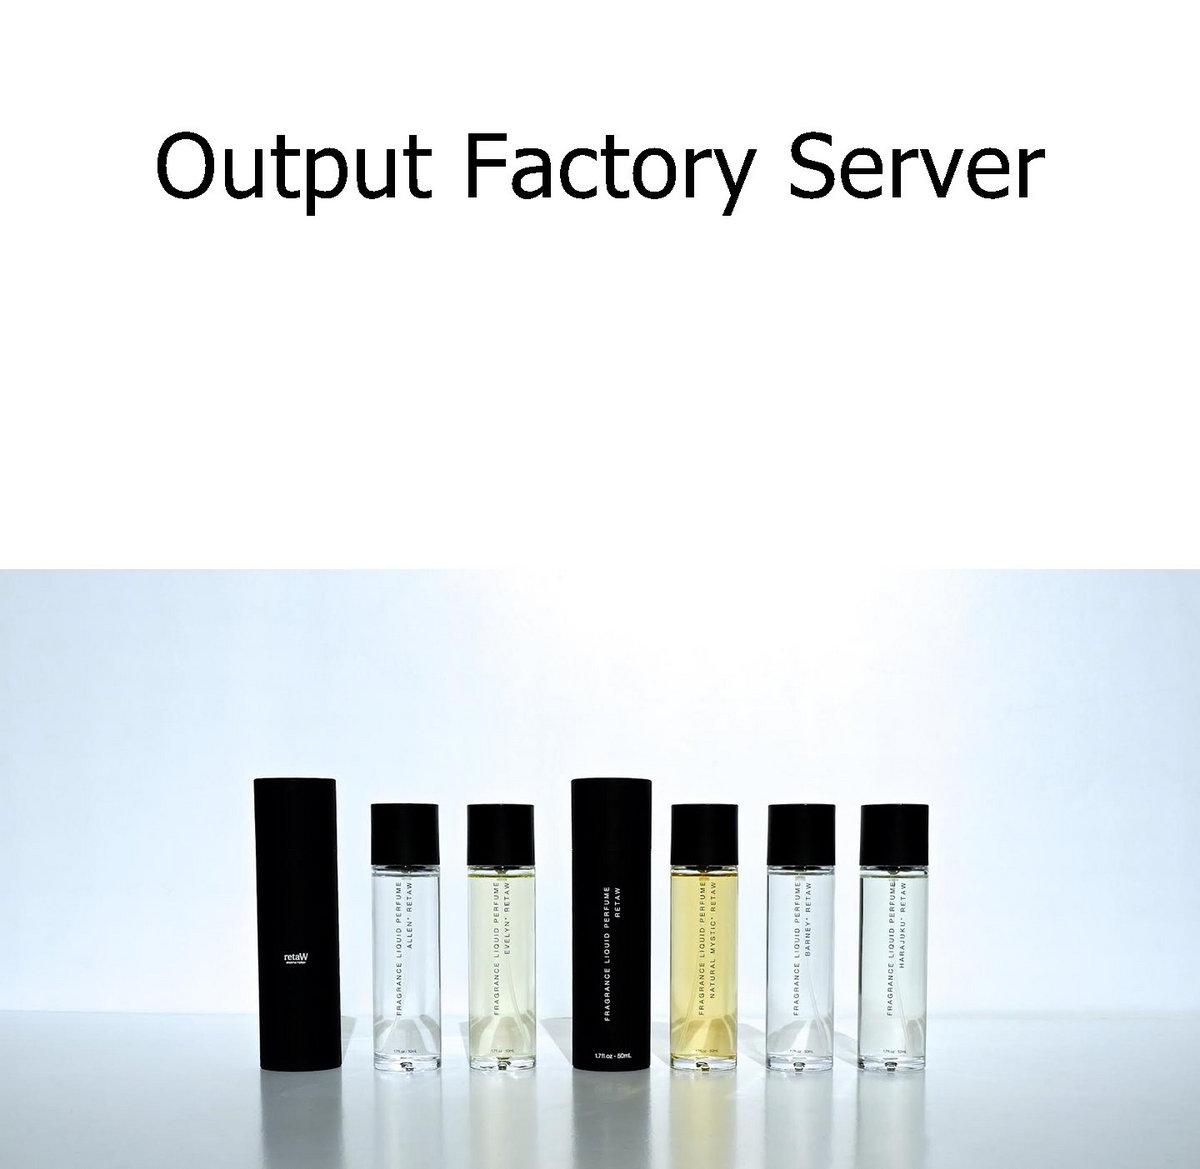 app) Output_Factory_Server_vers_2 1 23 zip how download to Sierra